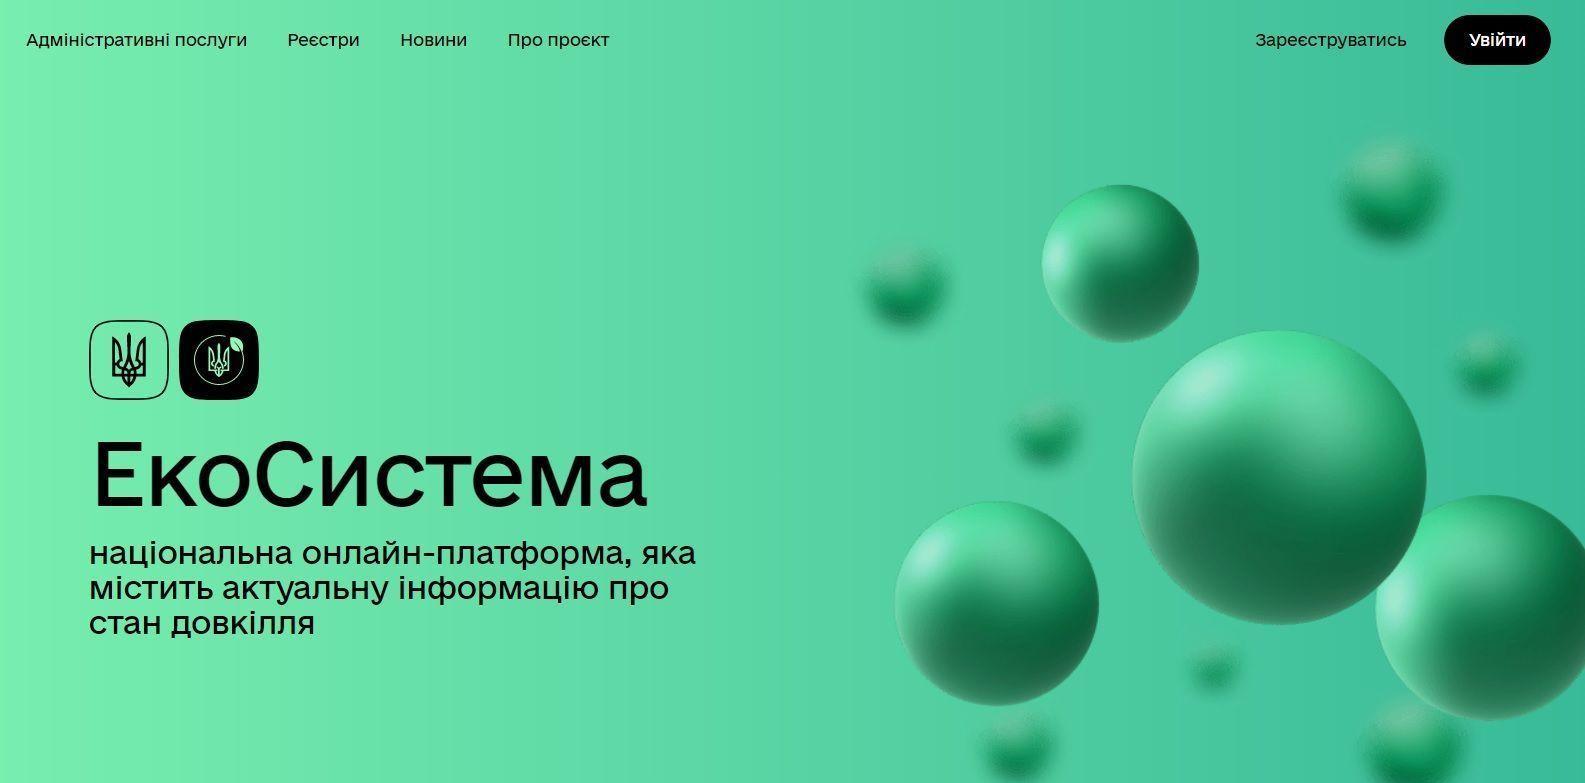 rubryka.com